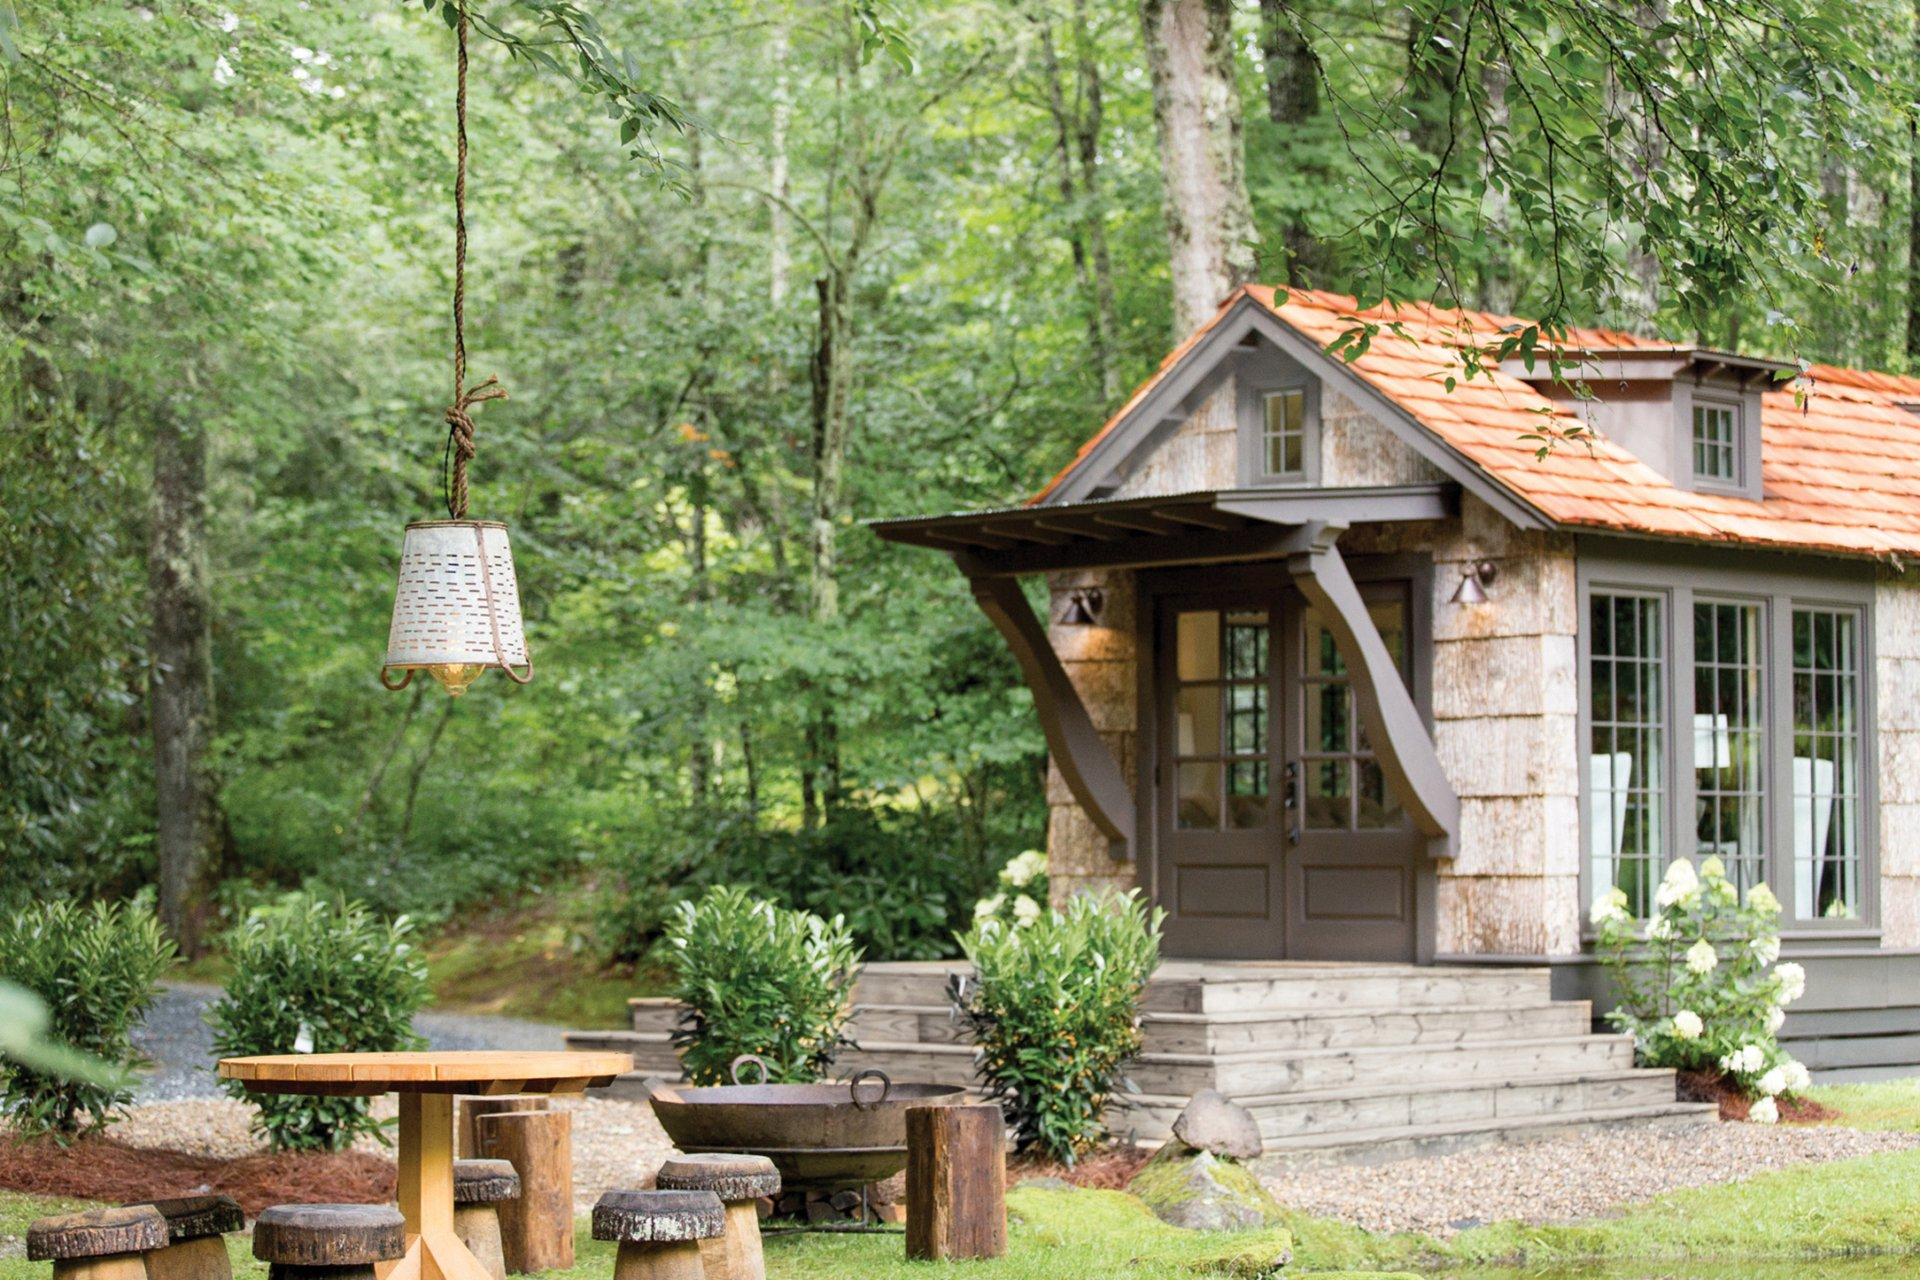 Triple Creek Tiny Home